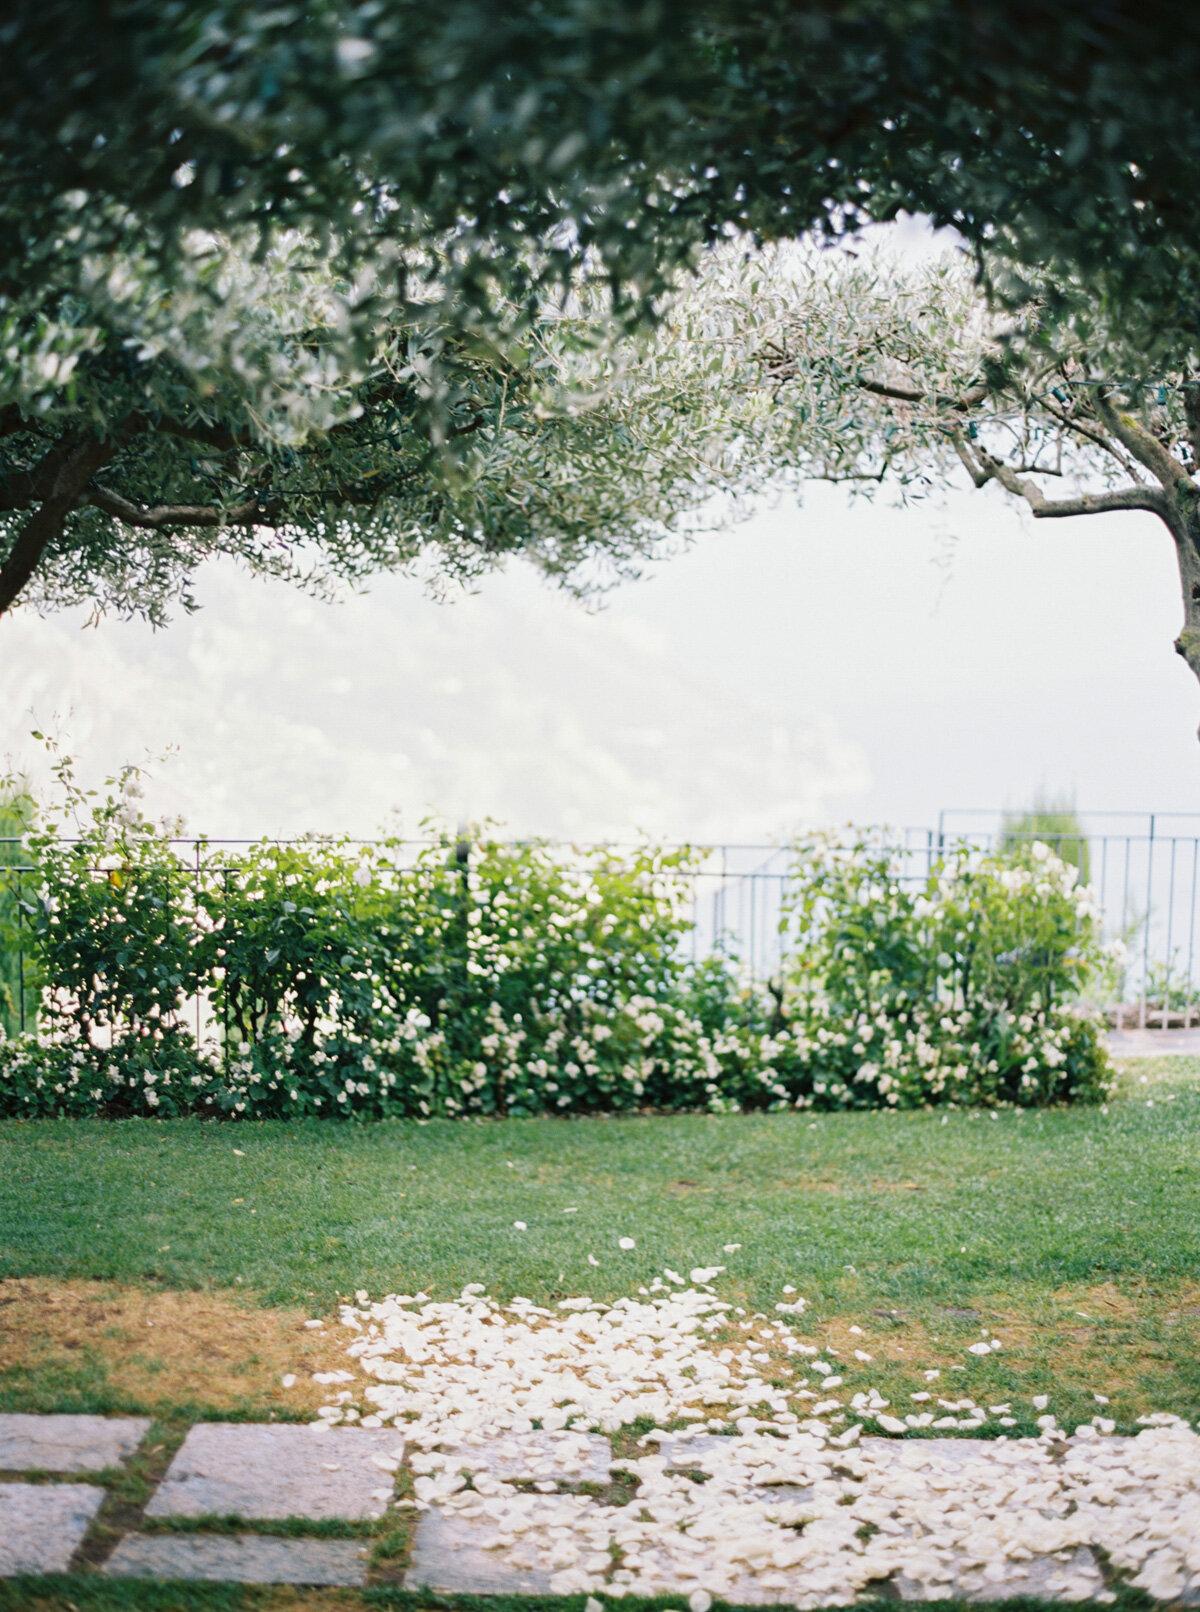 Belmond-Hotel-Caruso-ravello-elopement-Katie-Grant-destination-wedding (21 of 50).jpg